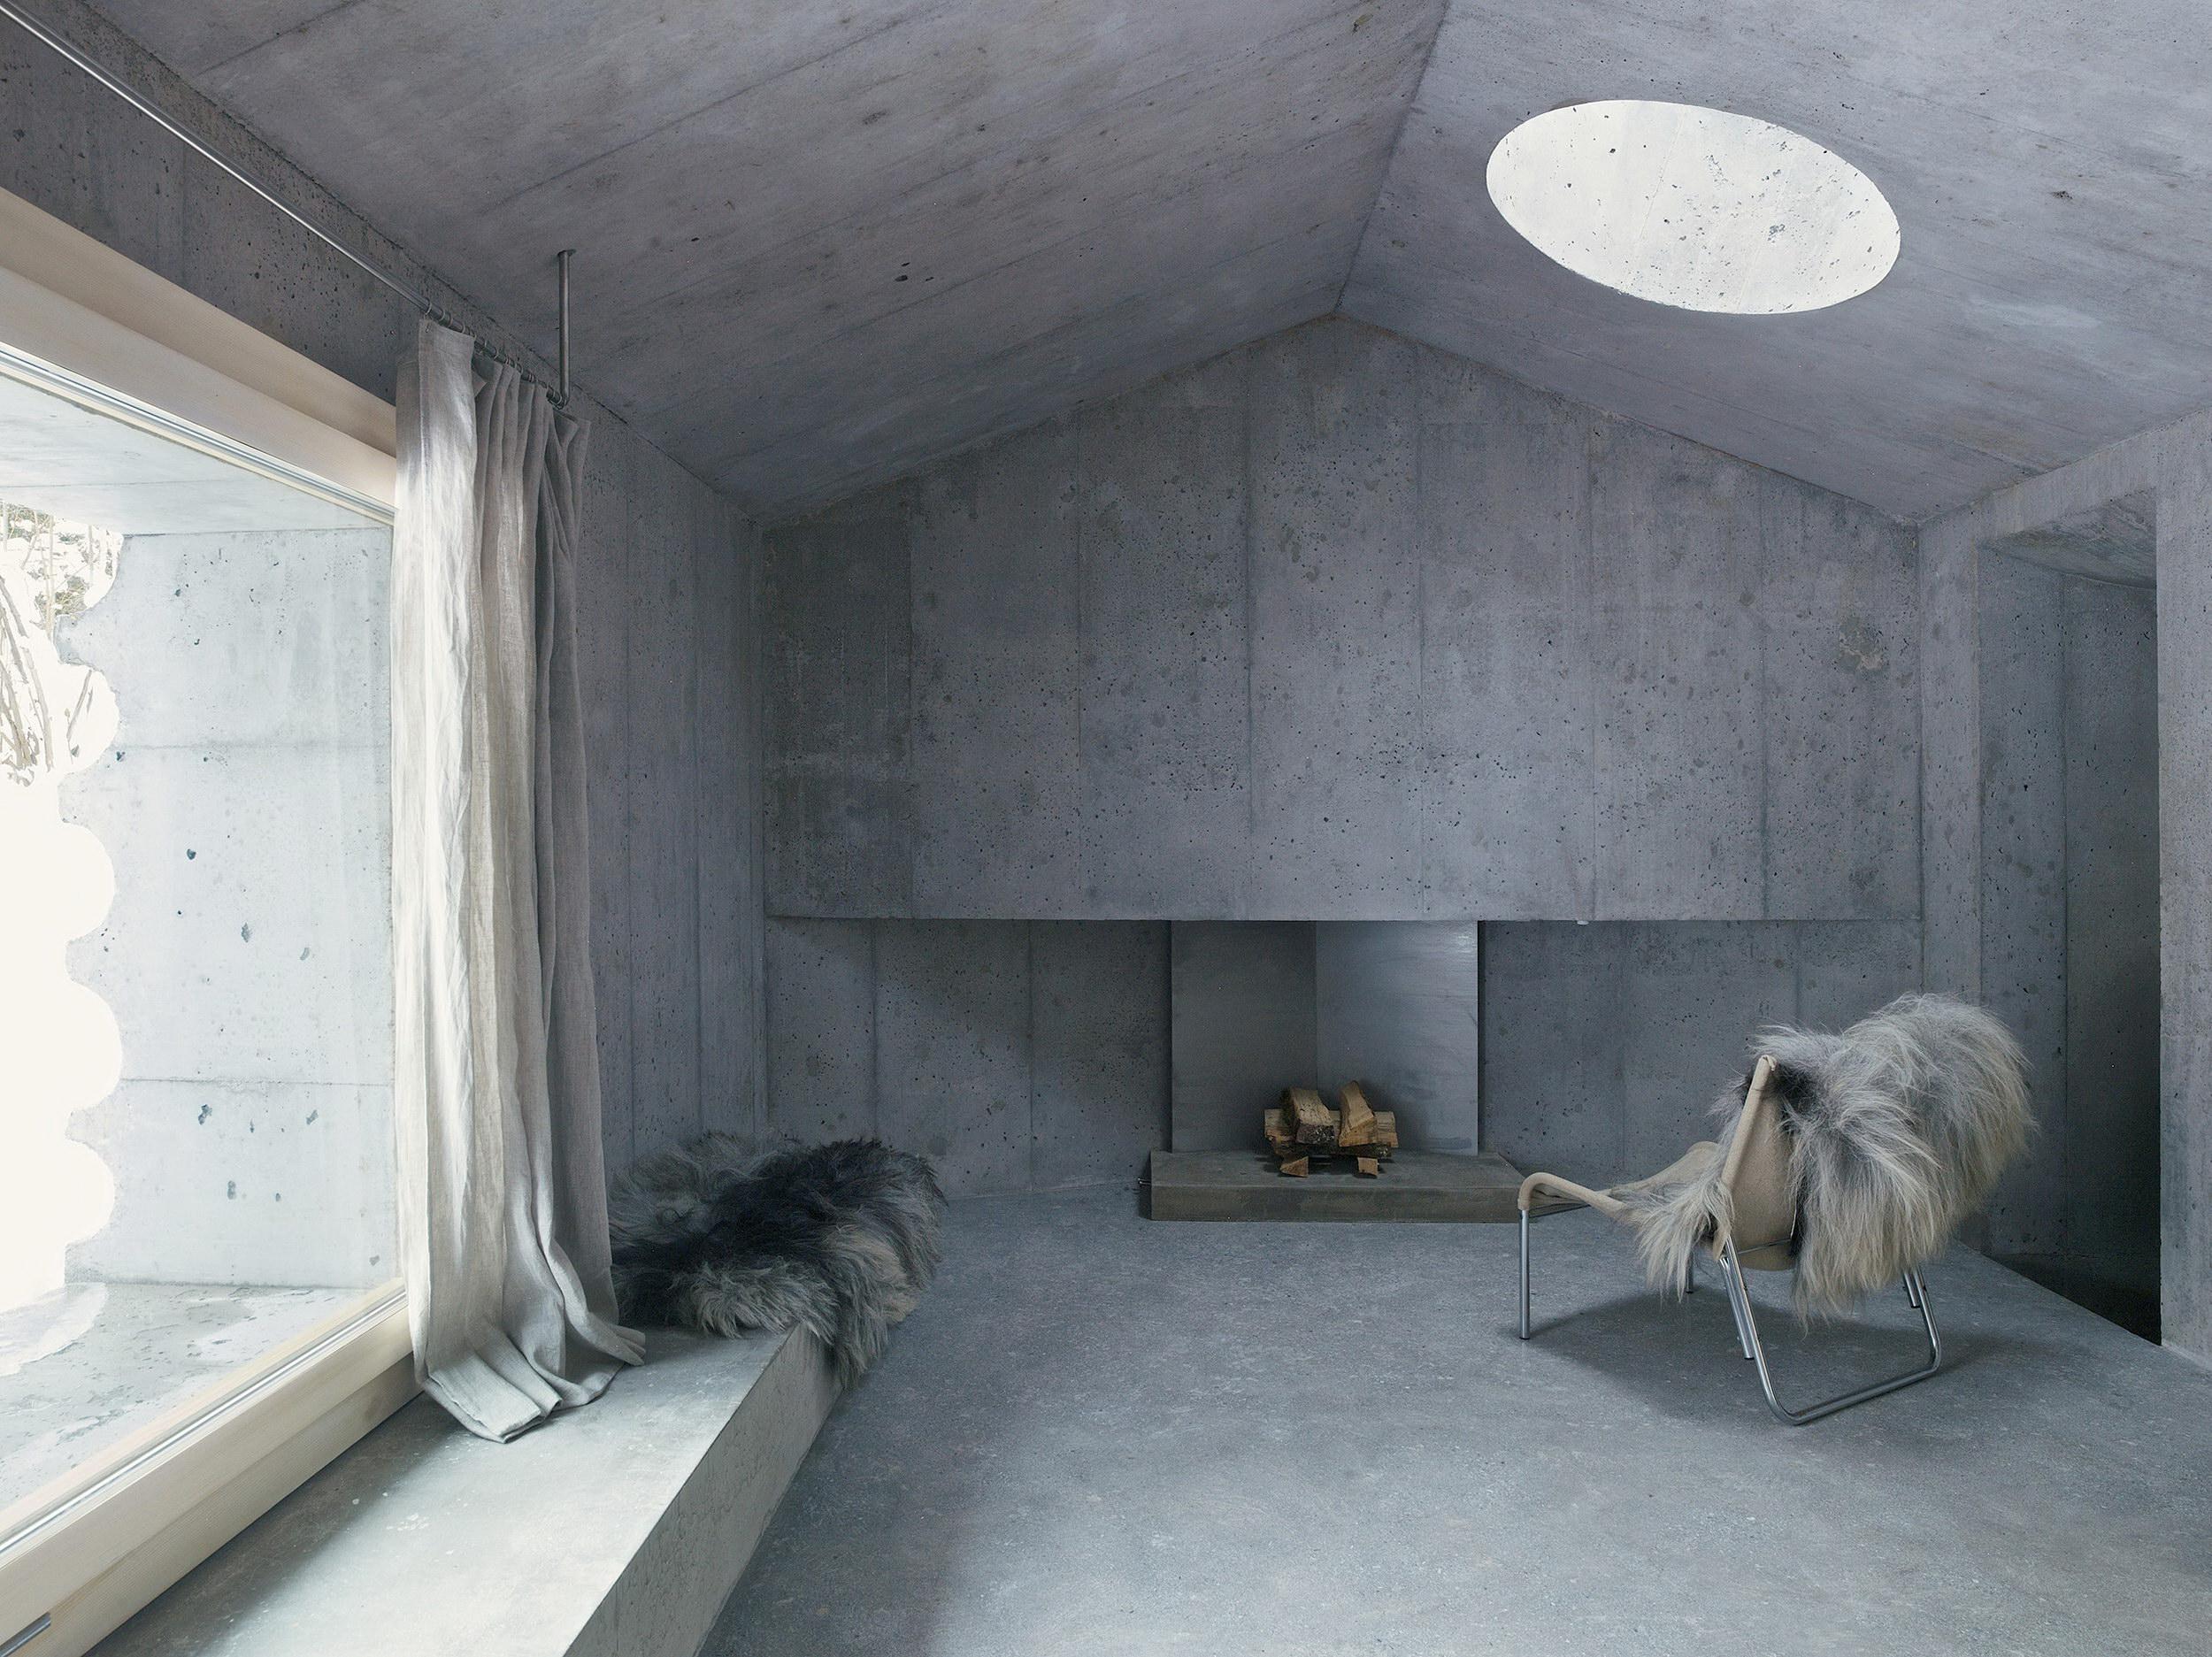 Refugi Lieptgas by Georg Nickisch and Selina Walder